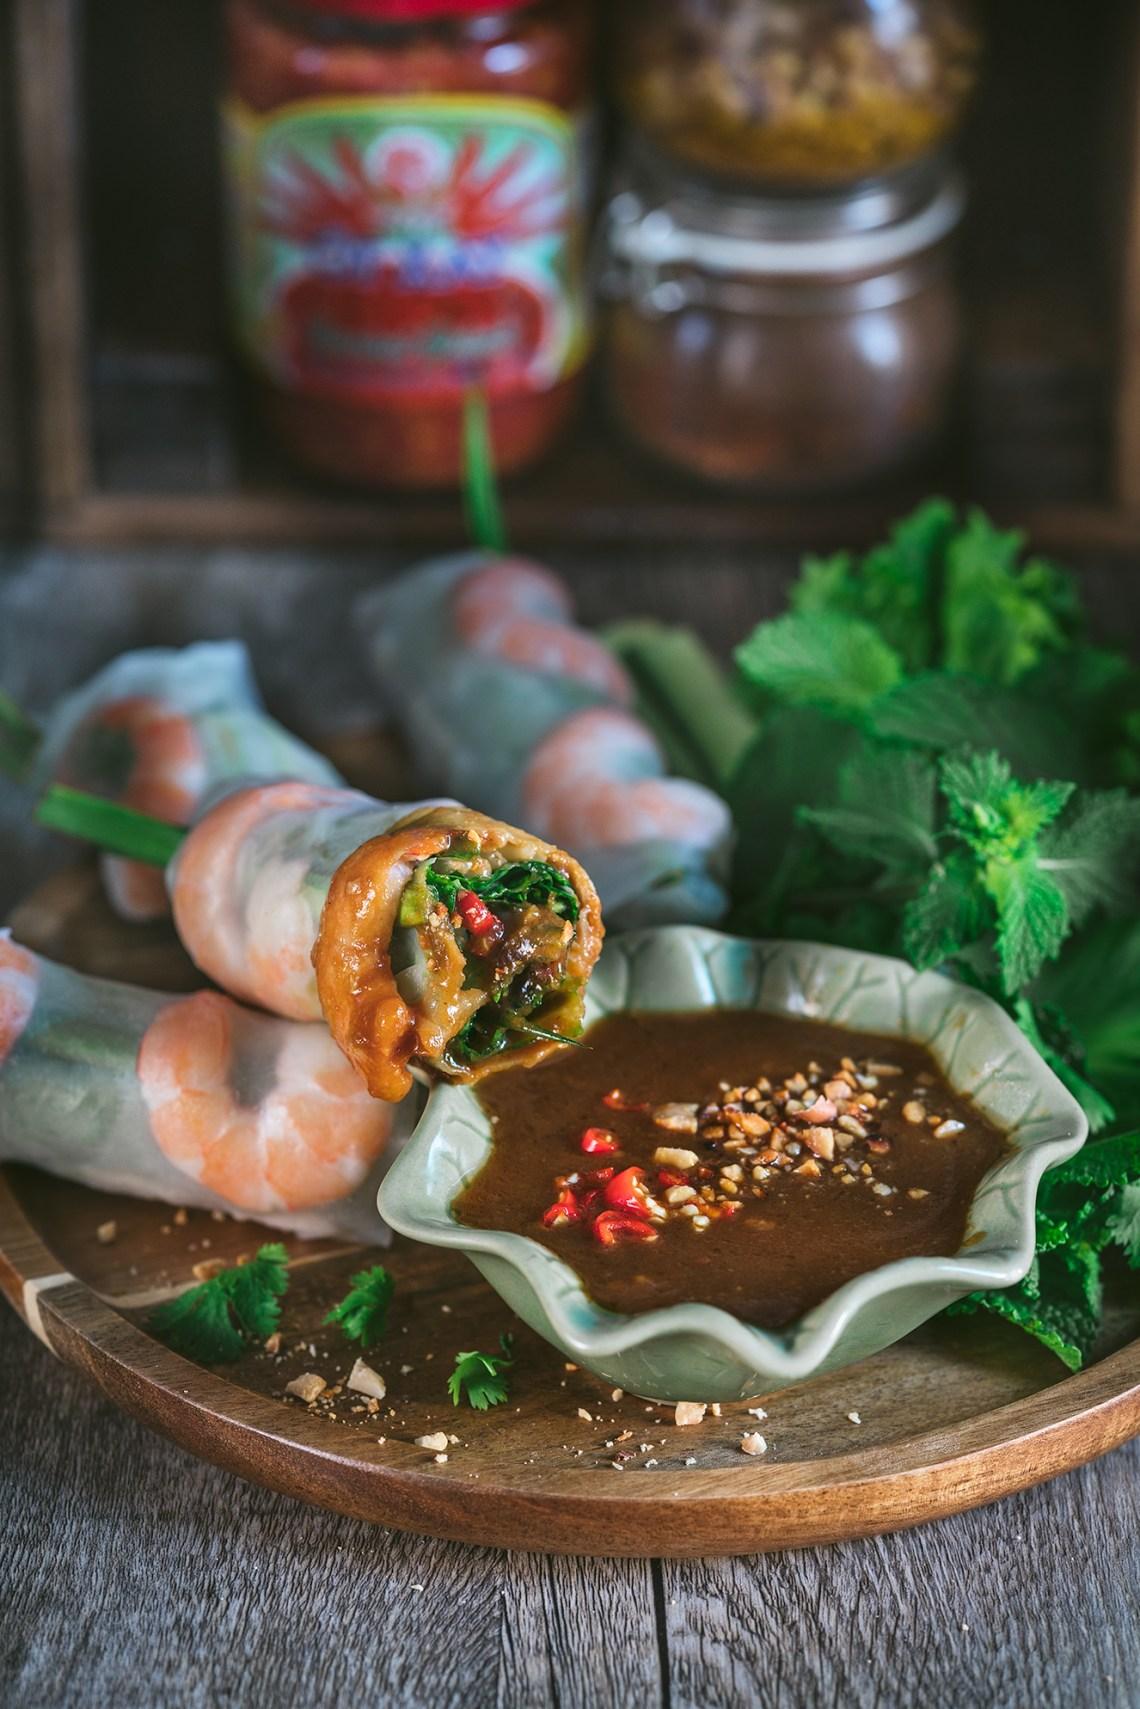 rollitos vietnamitas, rollitos fritos, goi cuon, rollitos de primavera, cocina vietnamita, comida vietnamita, rollitos